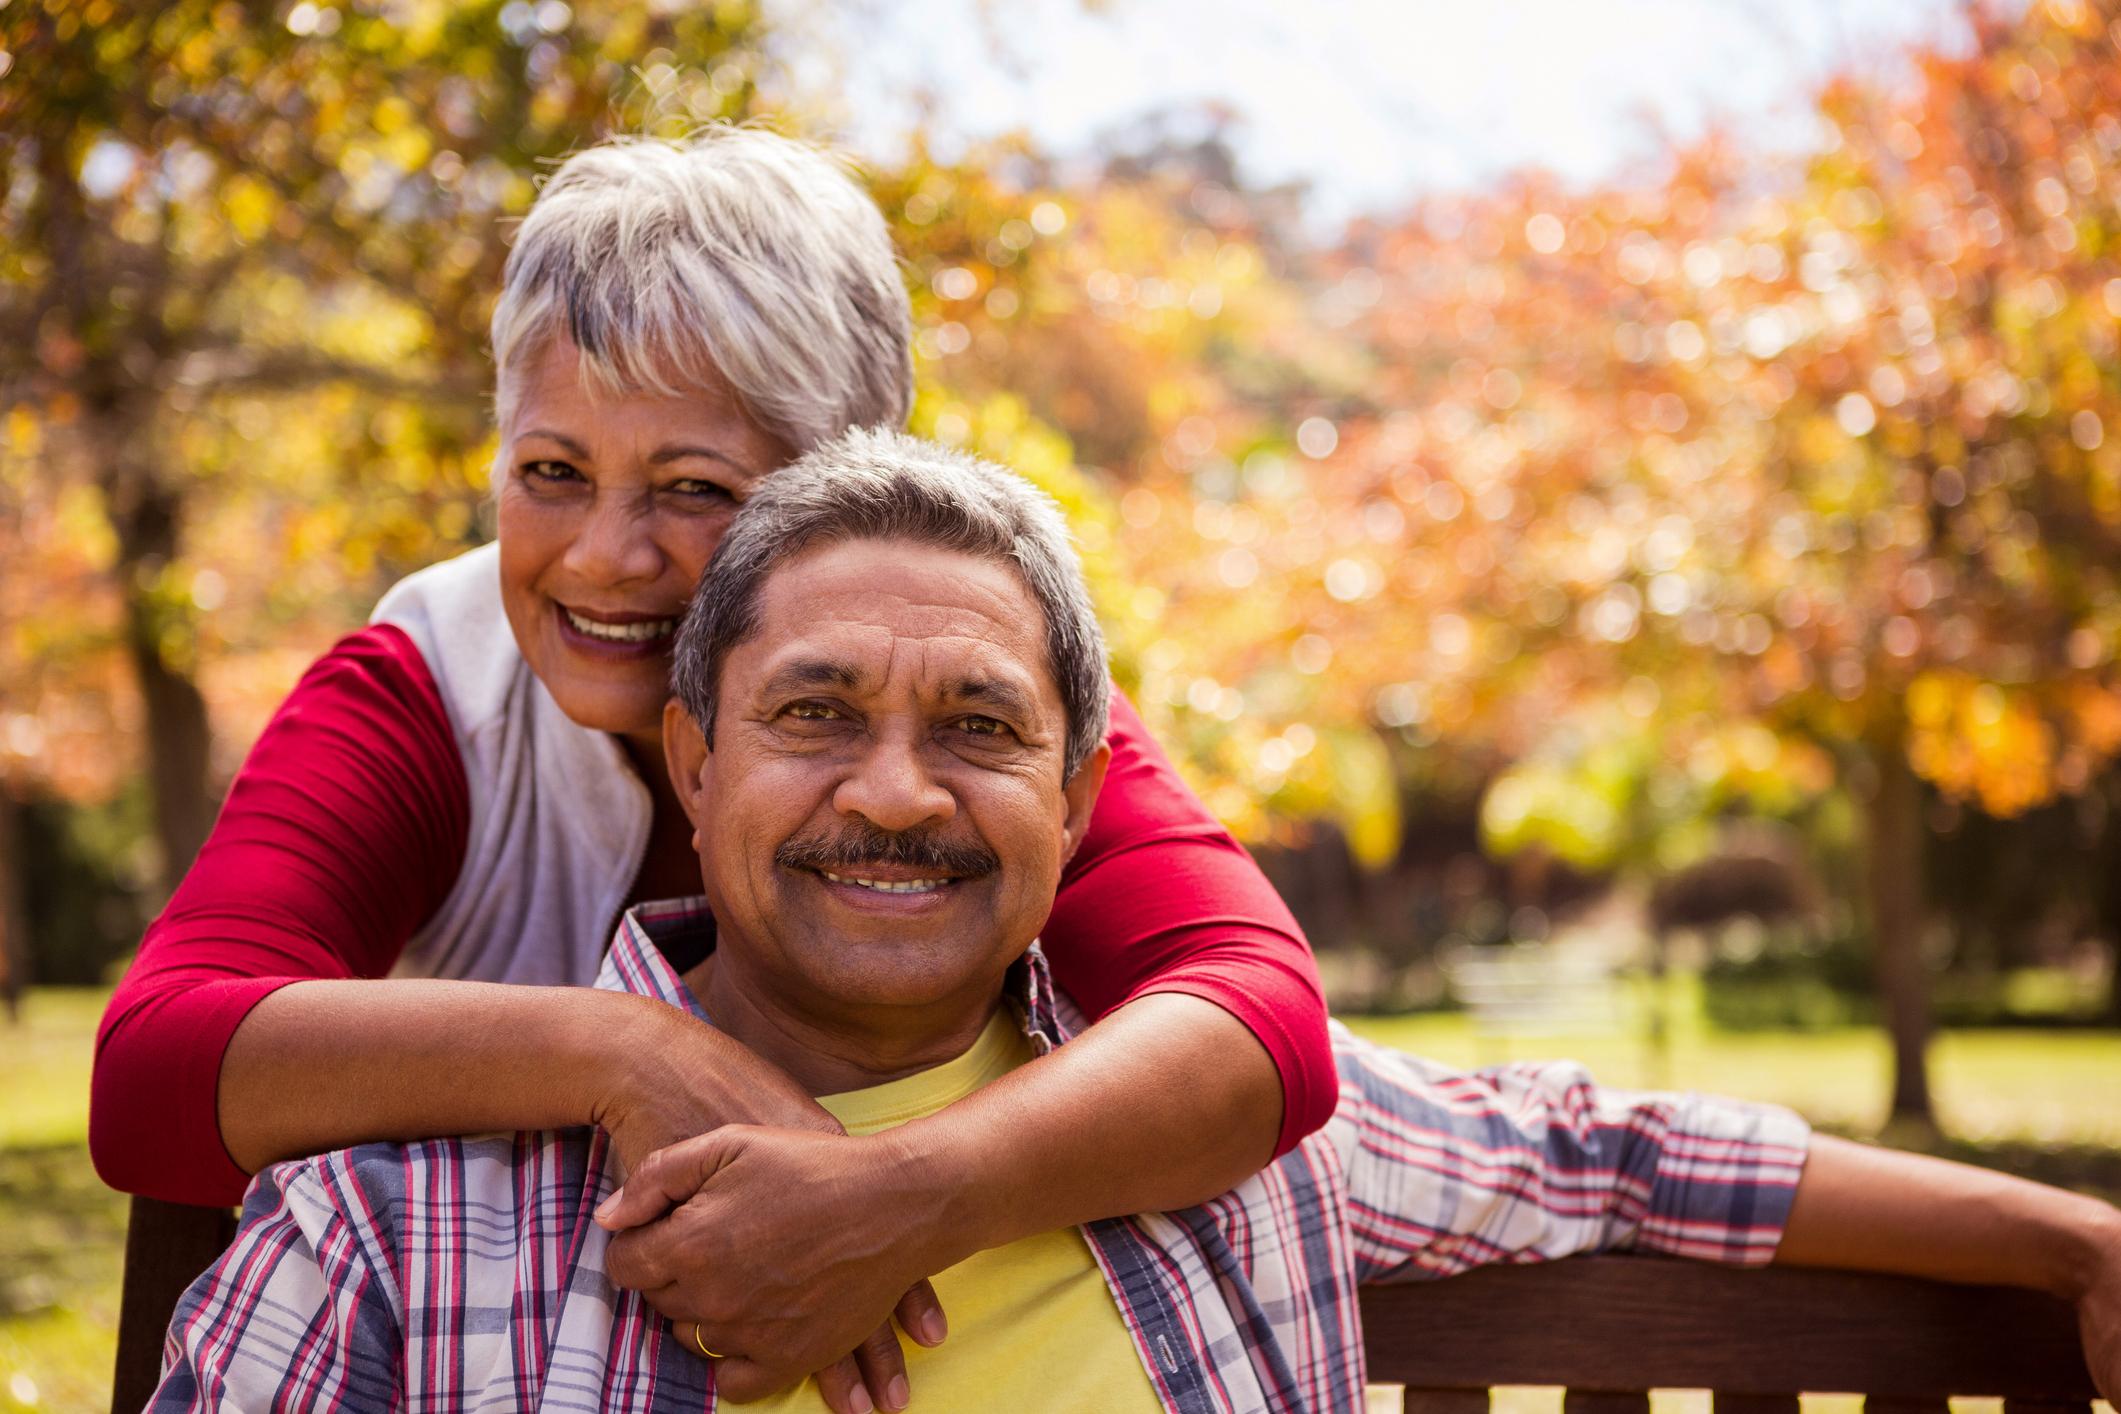 Senior woman putting arms around senior man outdoors